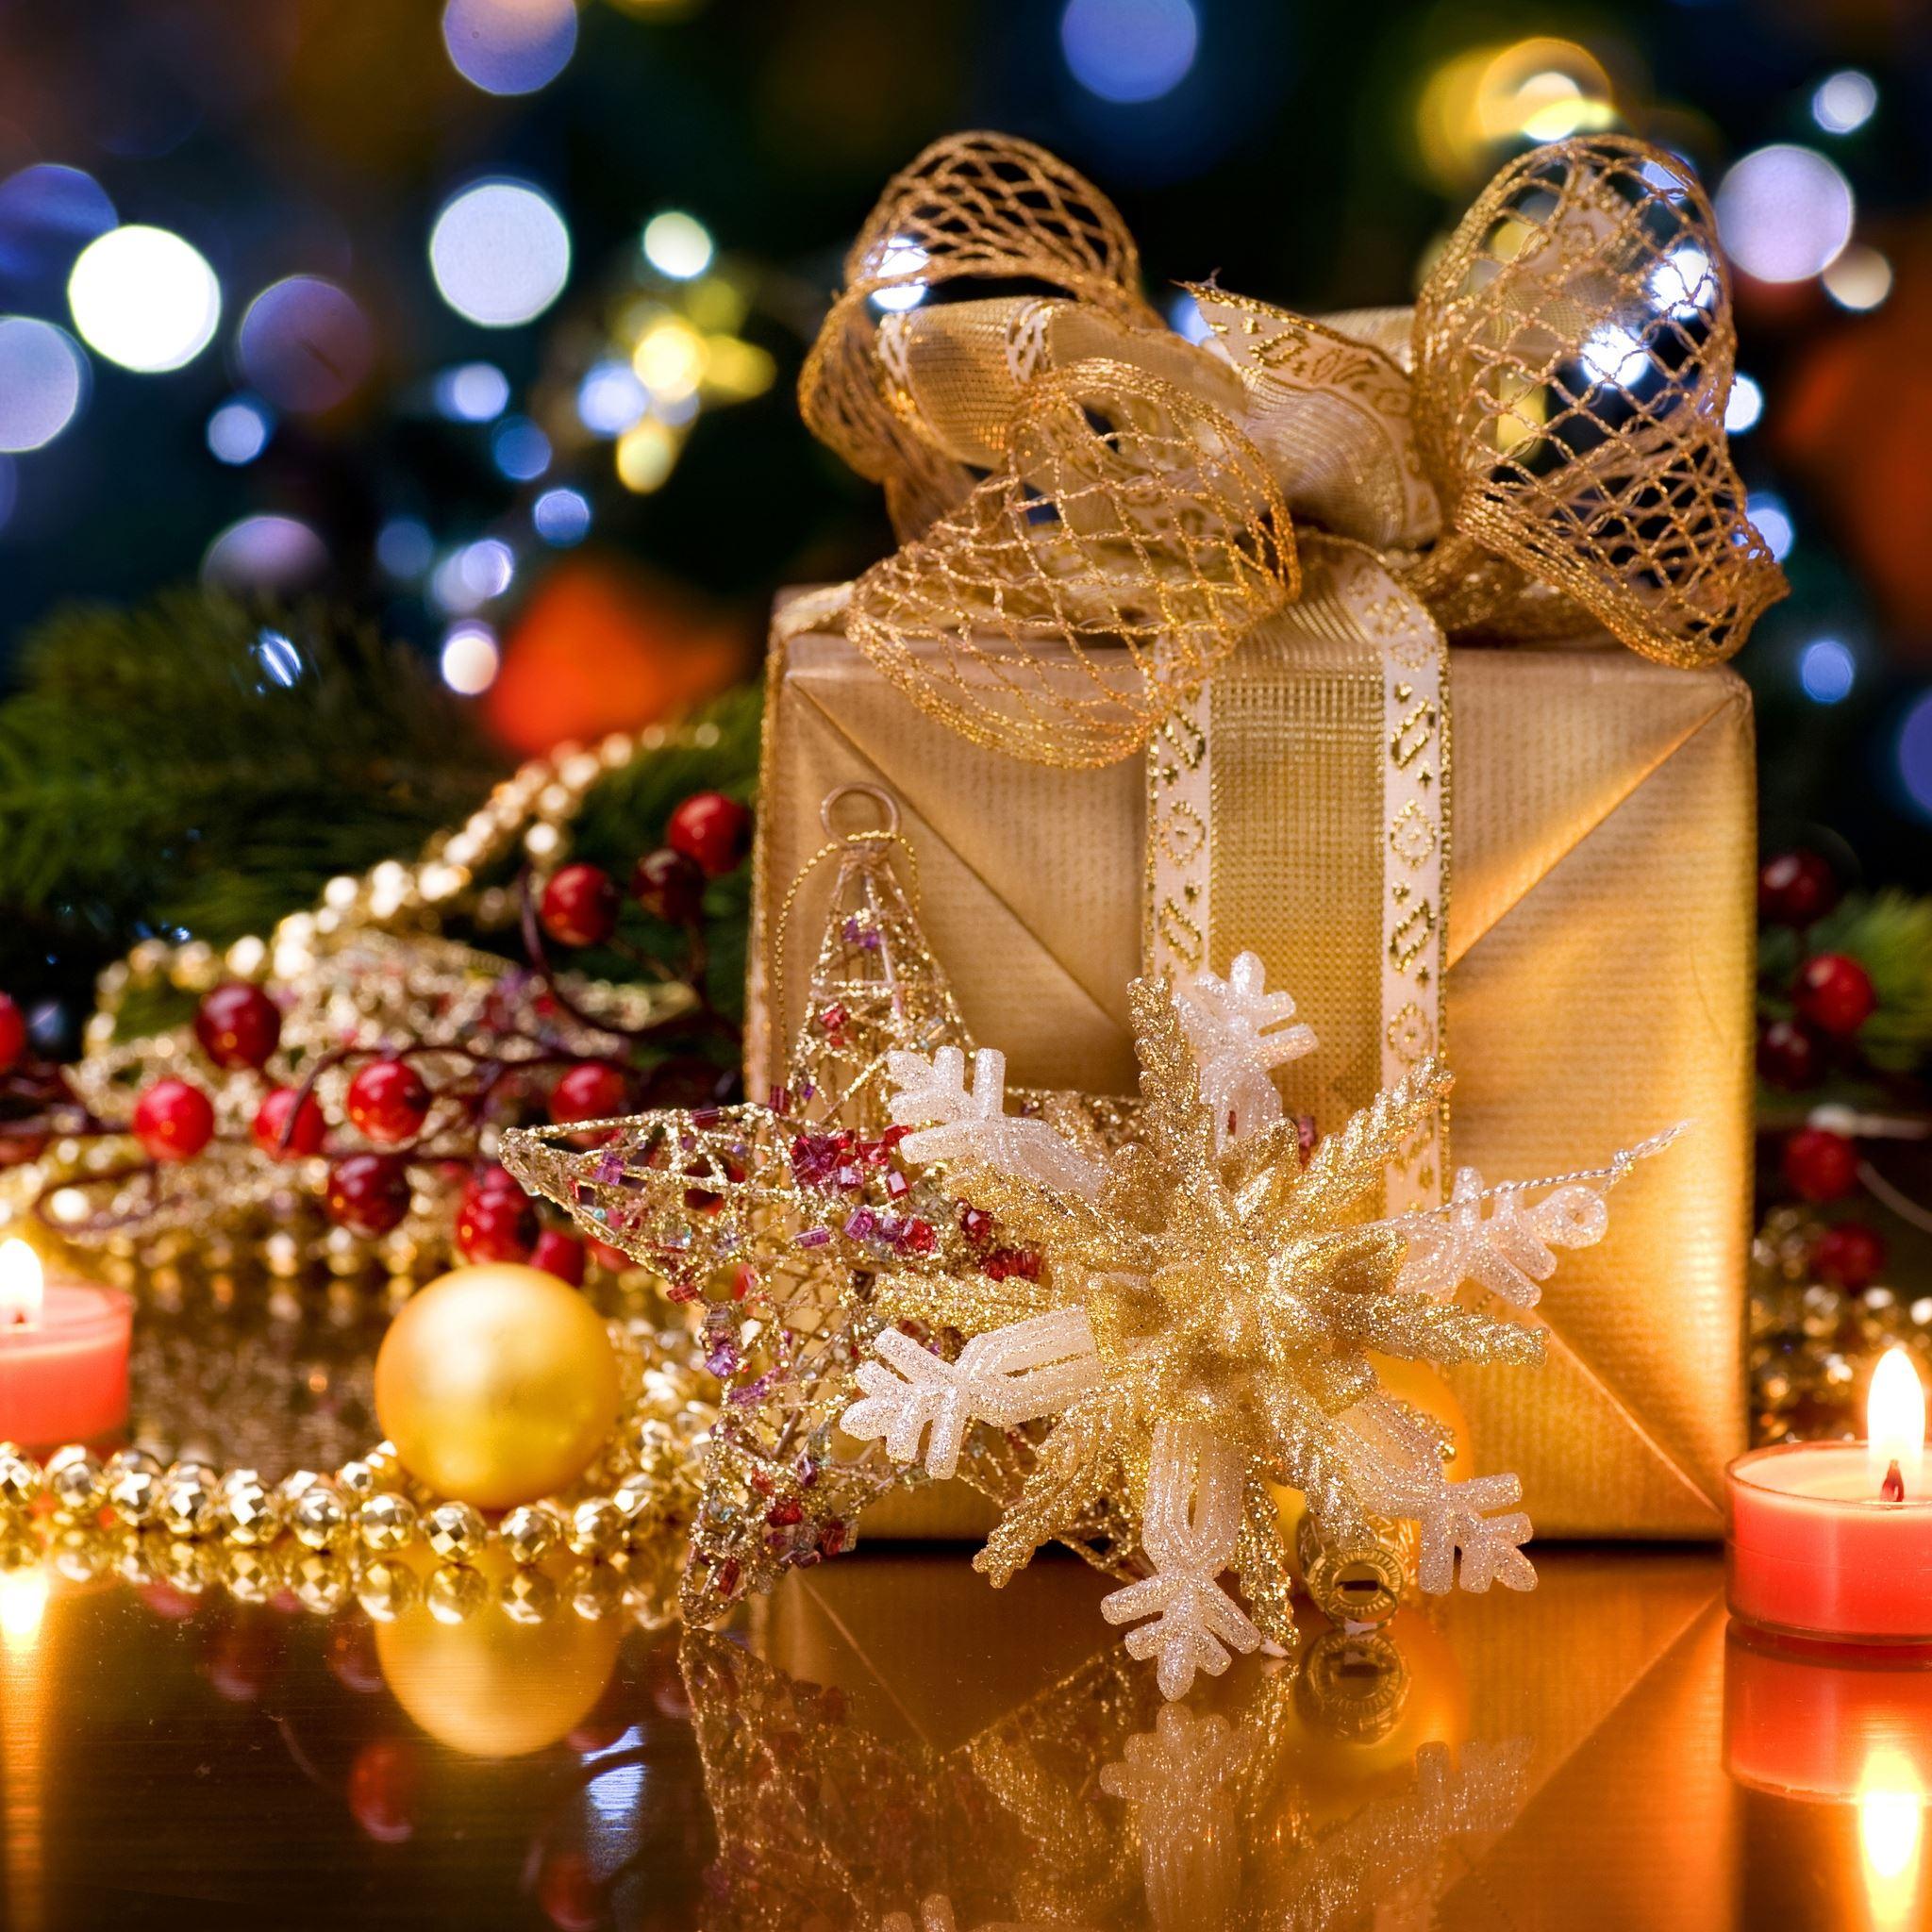 Christmas Gift Box Ipad Air Wallpapers Free Download